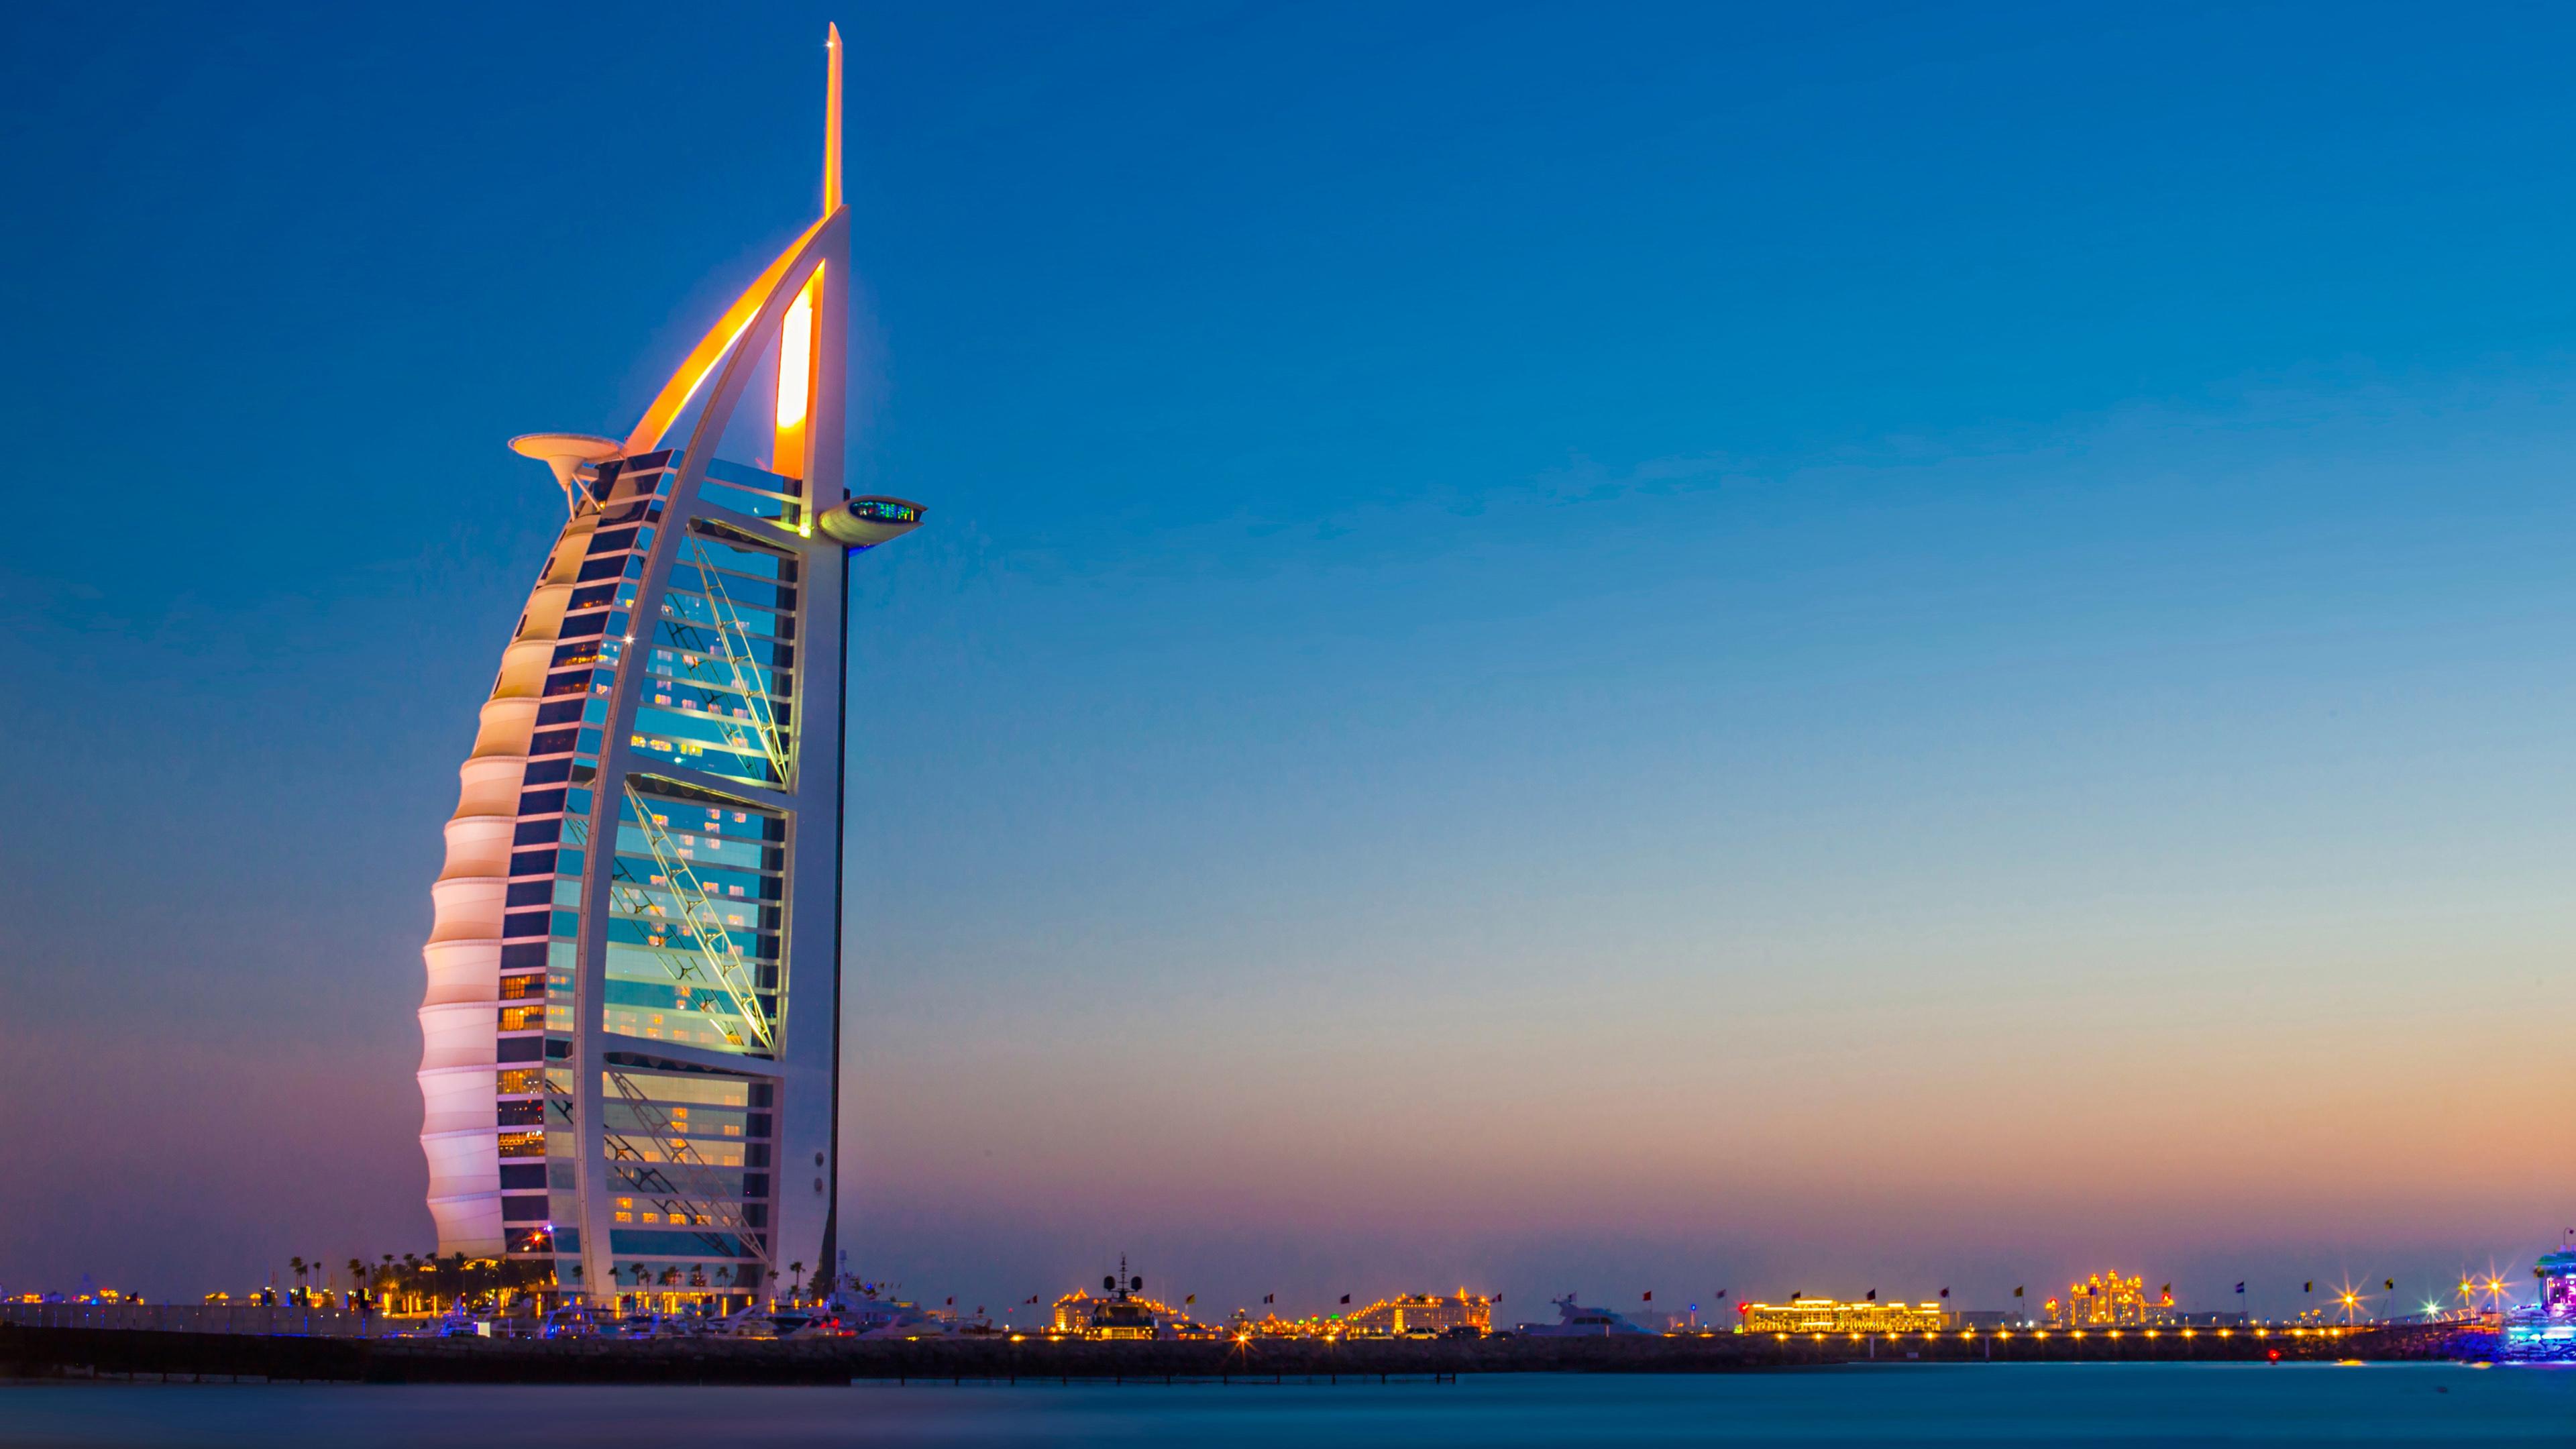 Free Hd Live Wallpapers For Pc Dubai Wallpaper Hd Pixelstalk Net